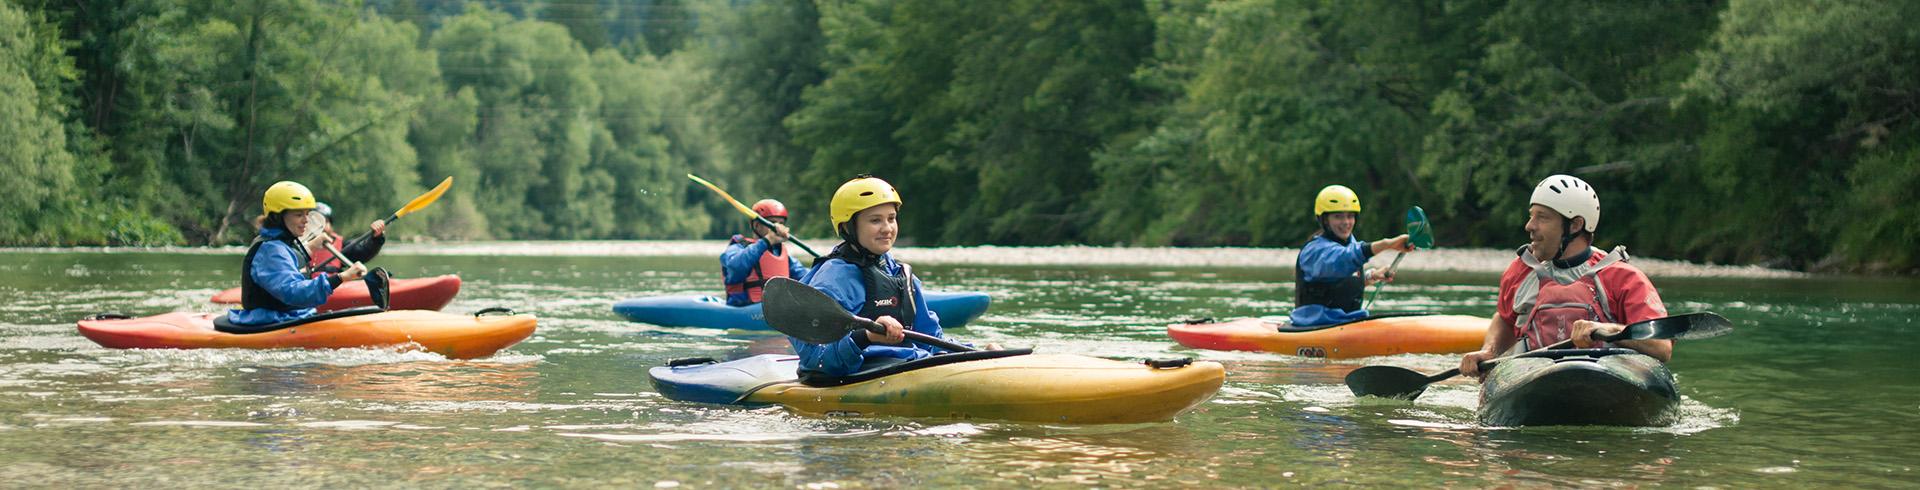 Kayaking trip, Sava Bohinjka river, Bled, Slovenia